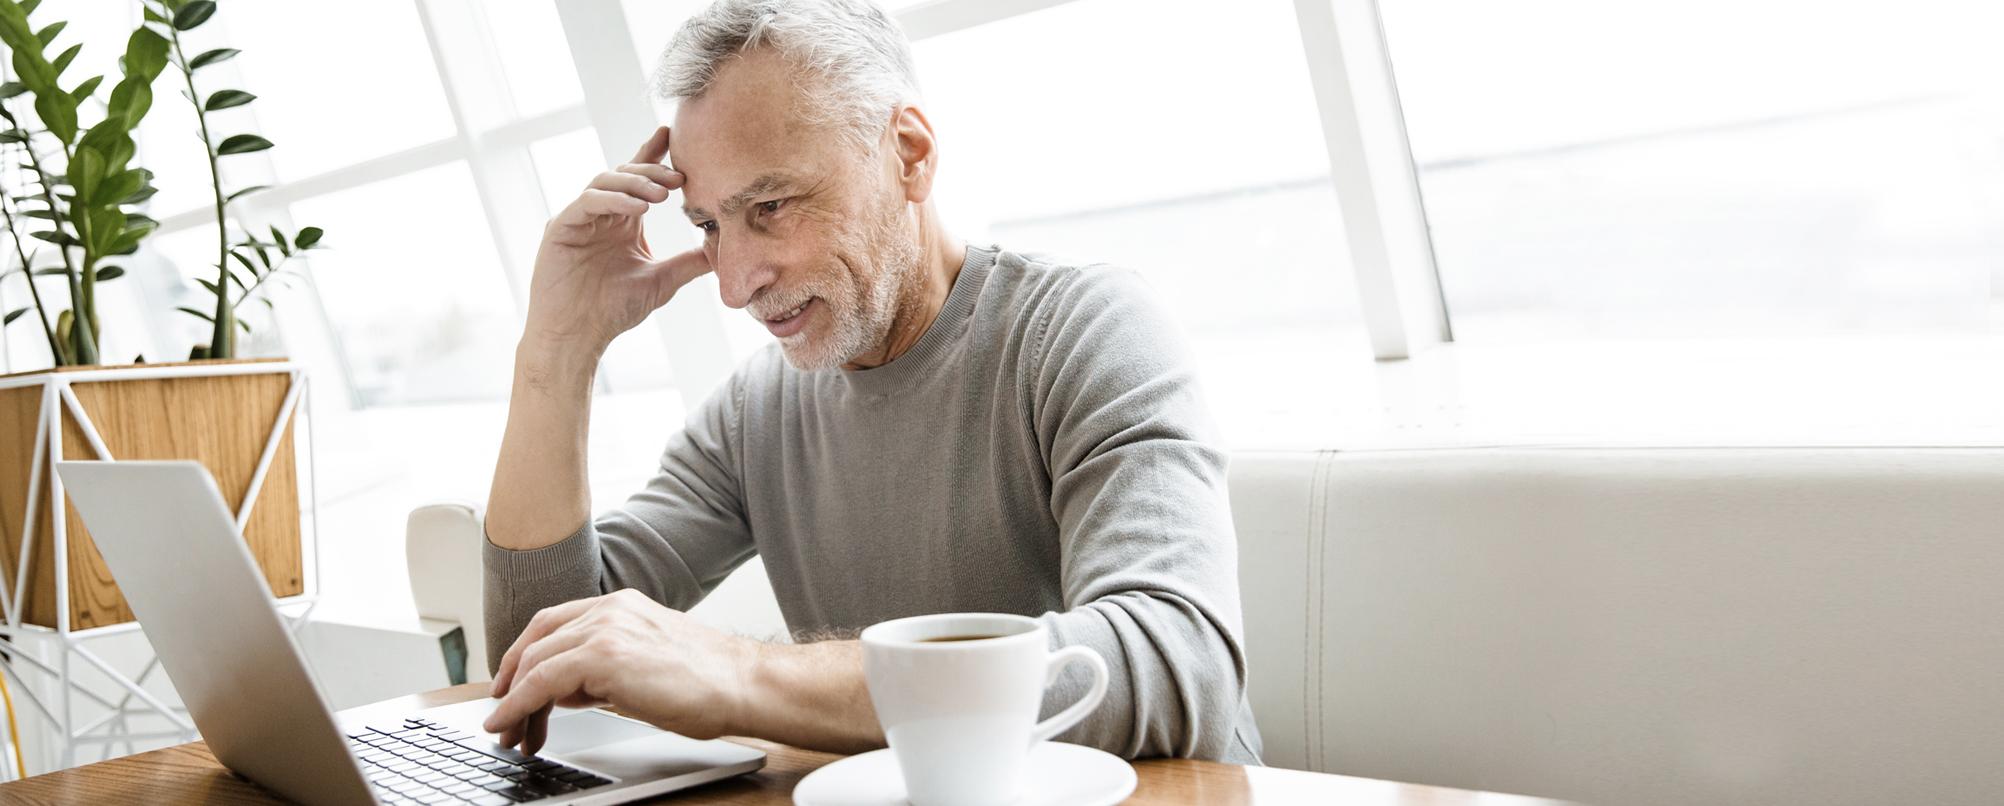 Stressed senior man browses on laptop in café